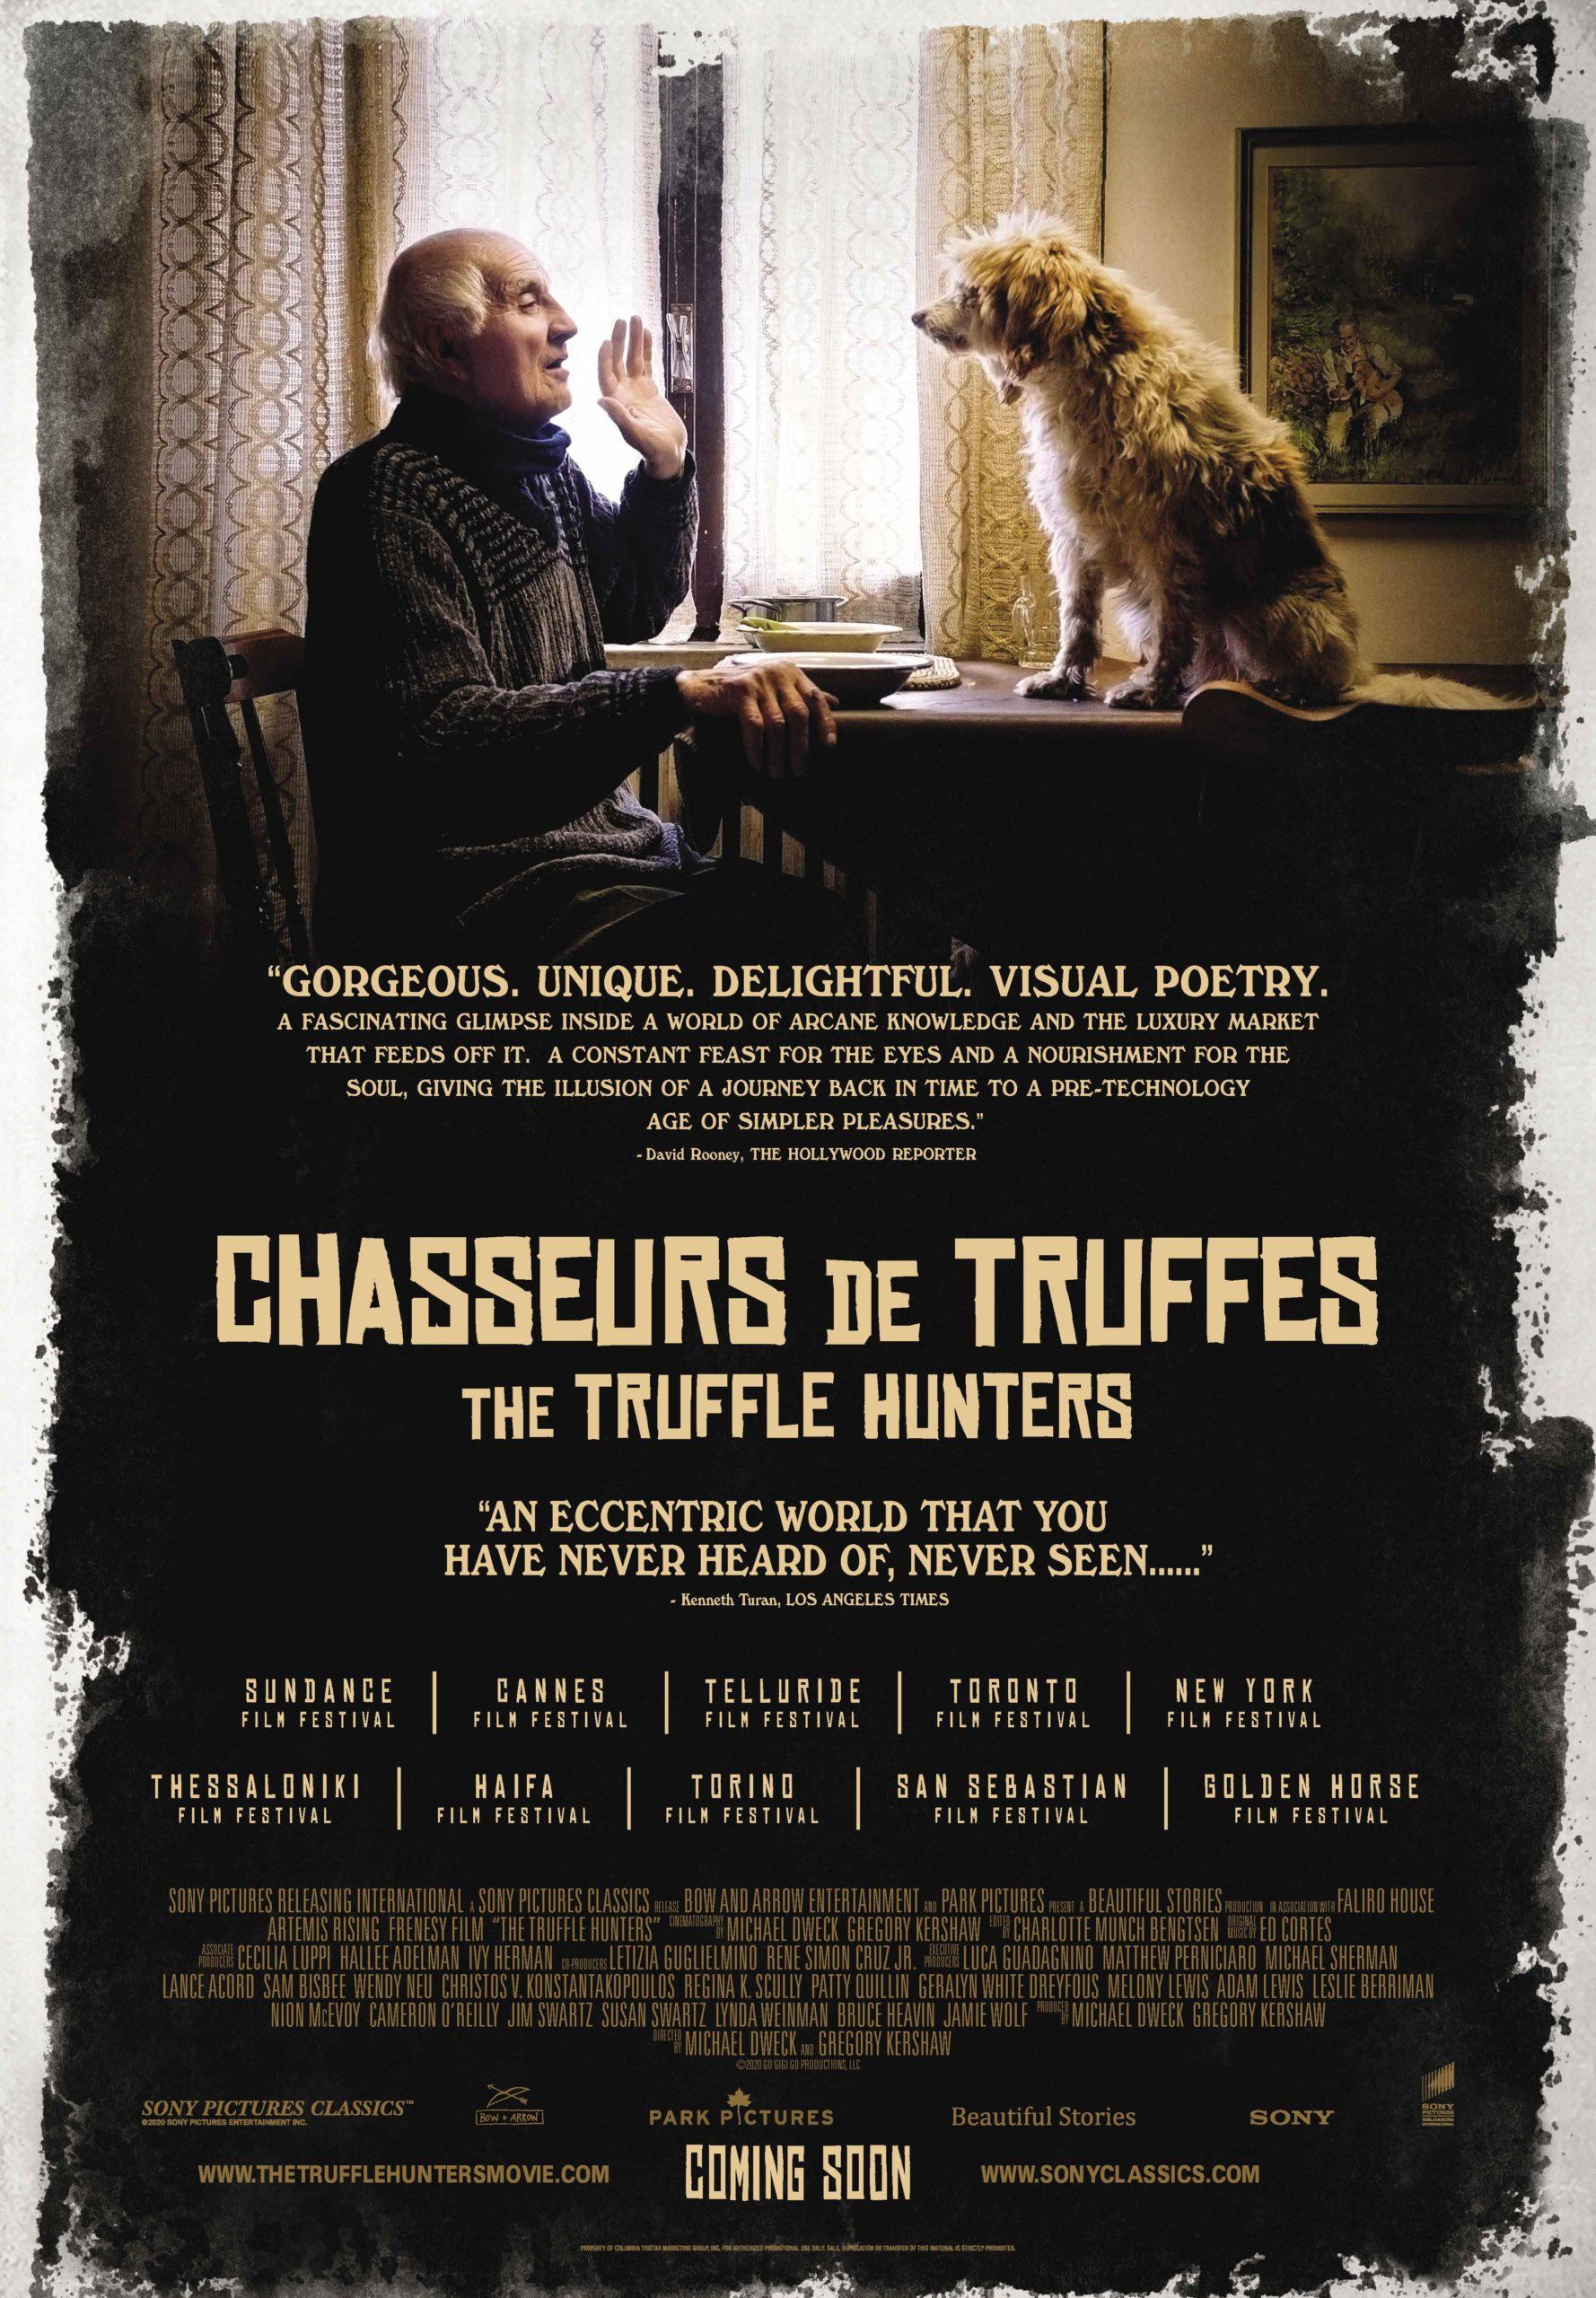 THE TRUFFLE HUNTERS (CHASSEURS DE TRUFFES)